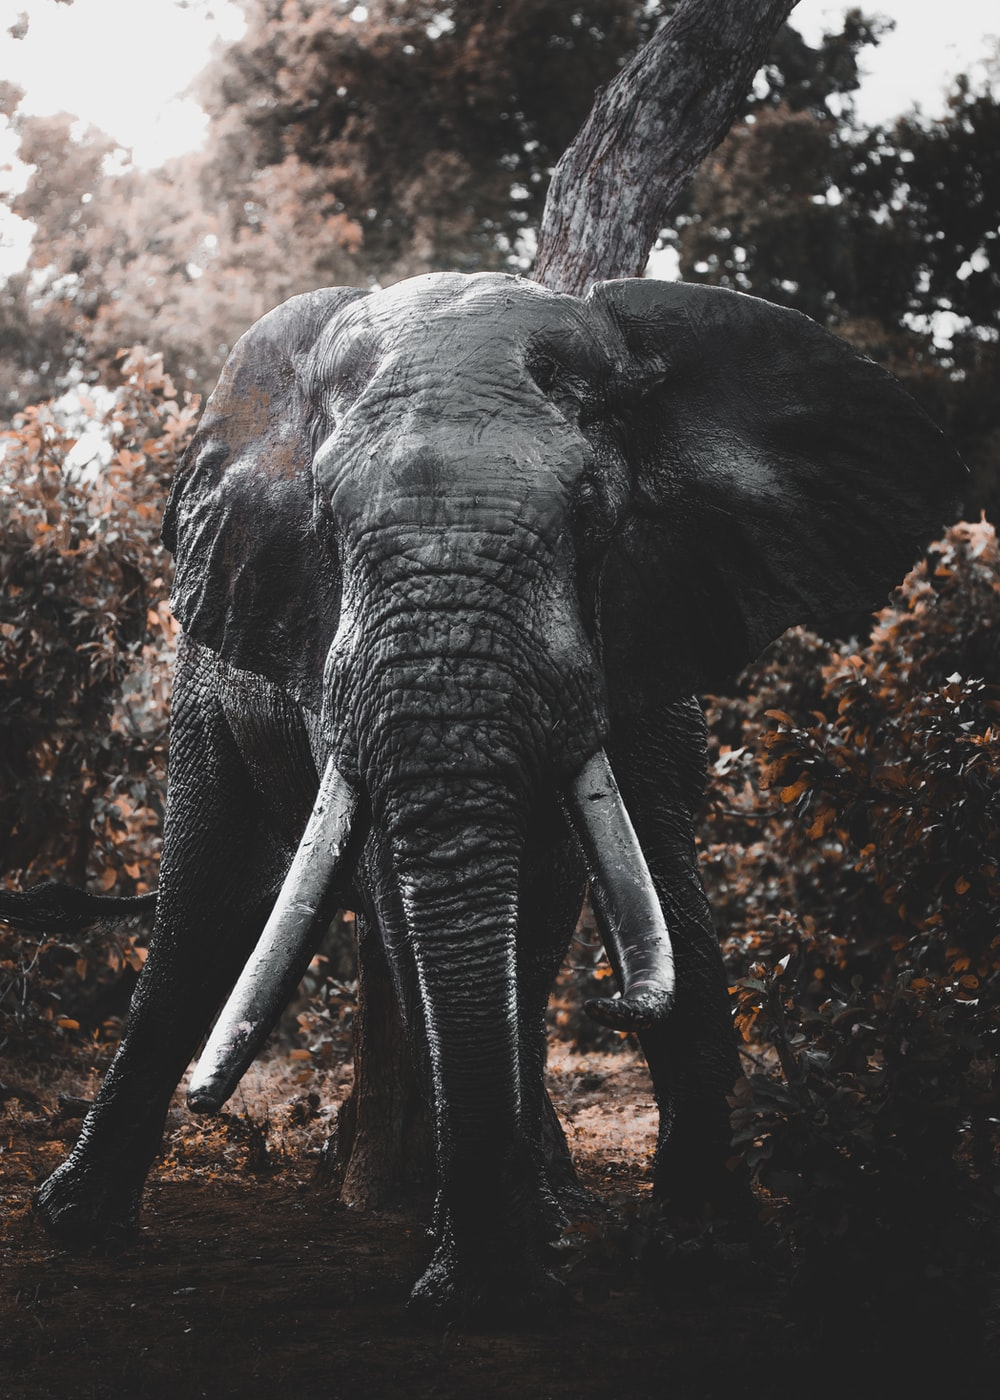 grey elephant walking on brown ground during daytime